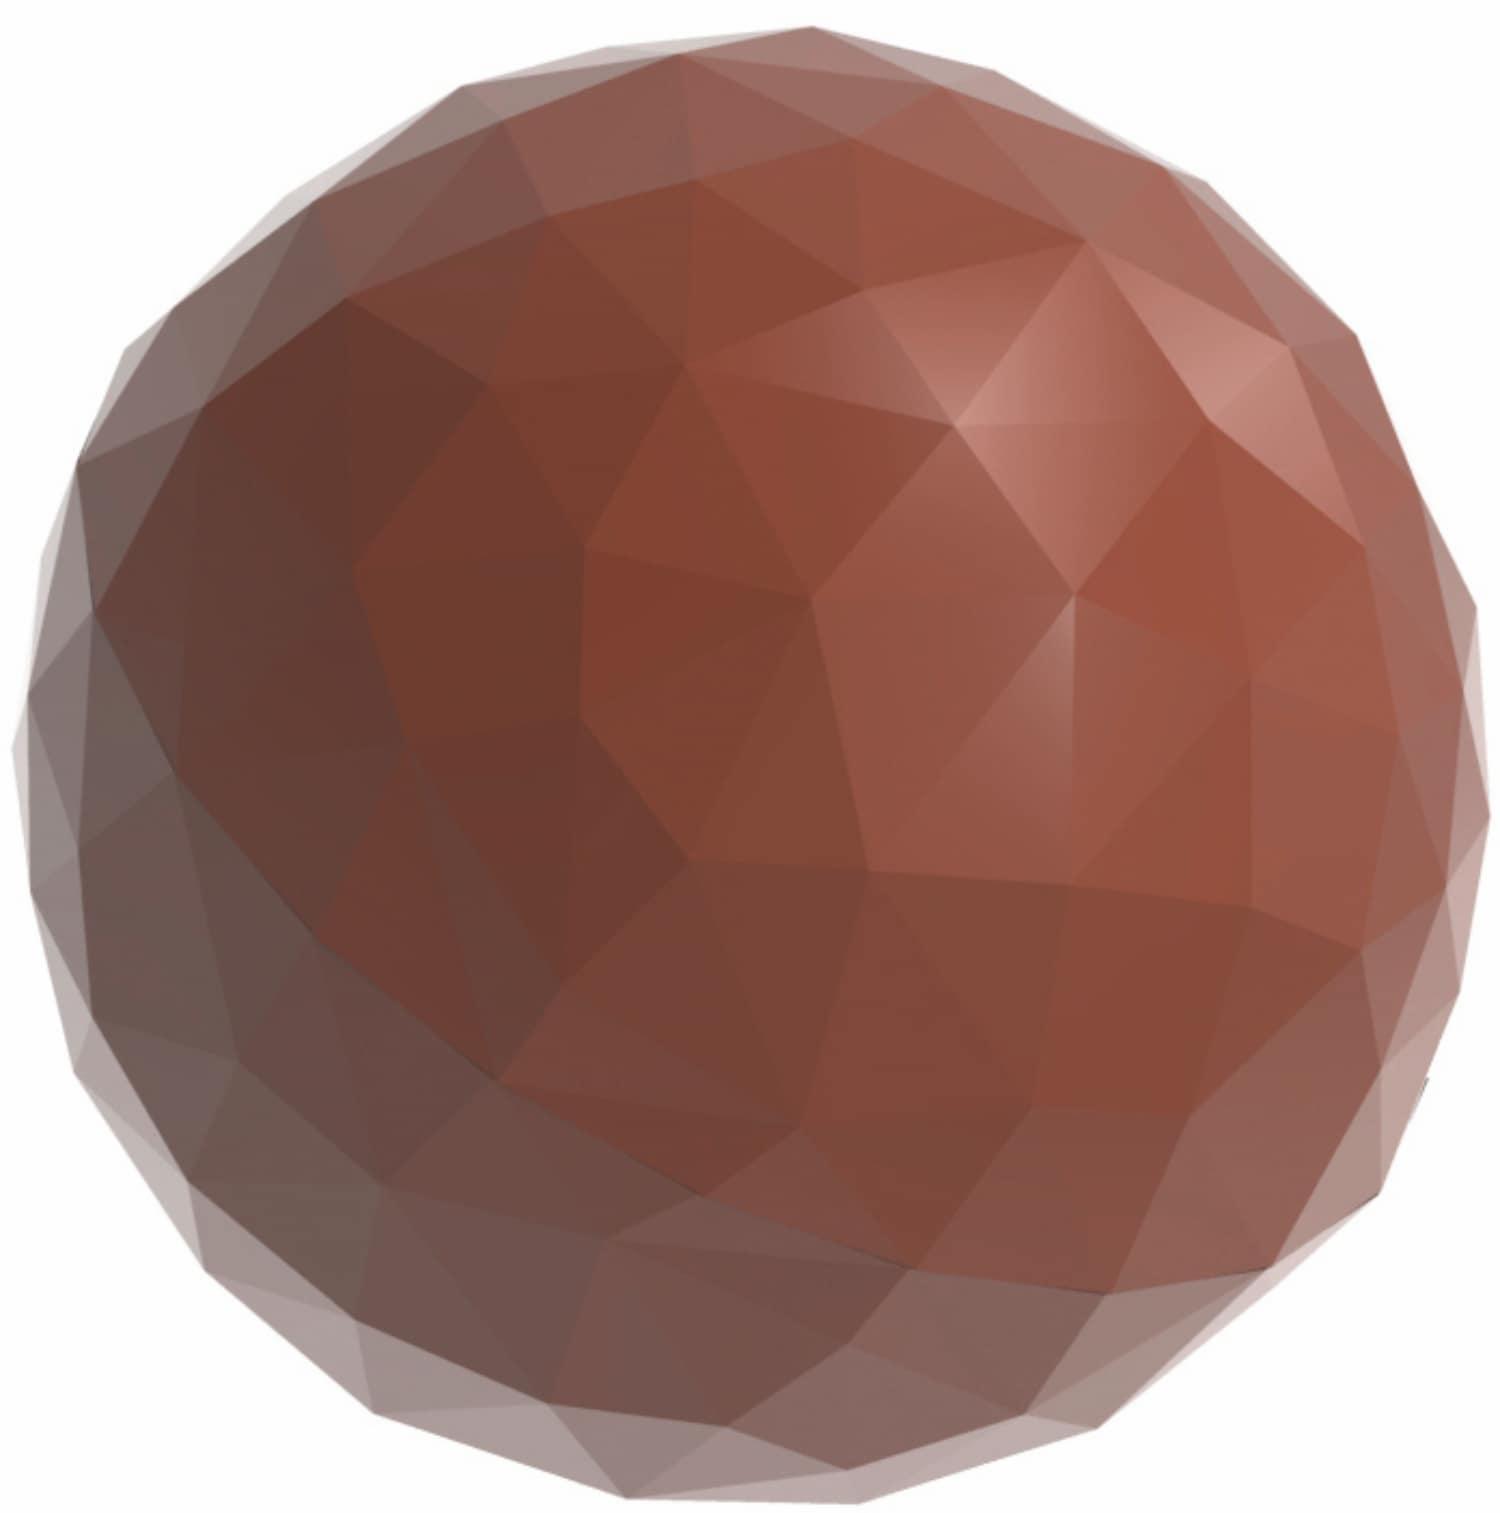 "Schokoladenform ""Kugel"" 421909"